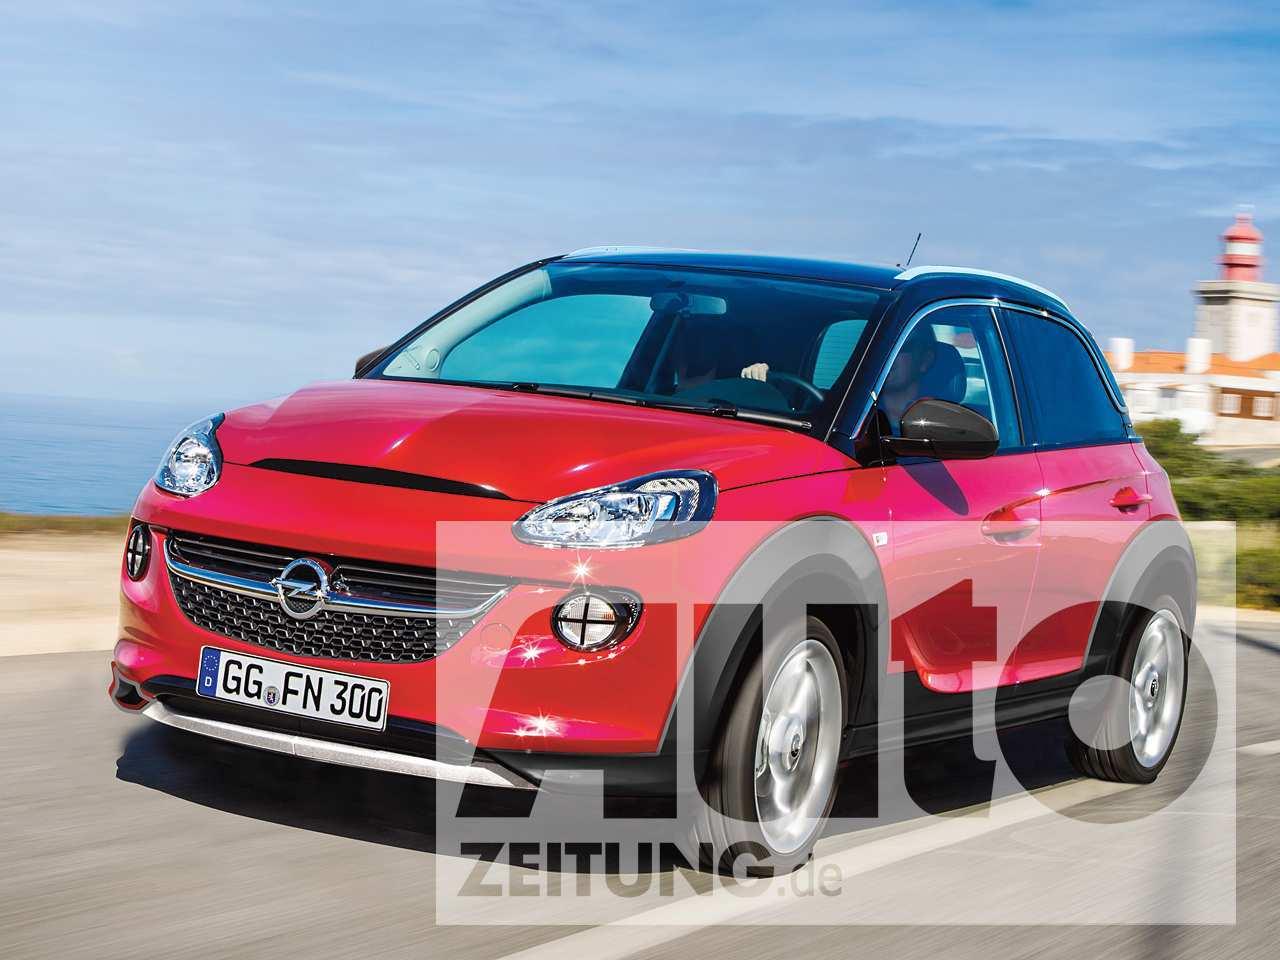 35 New Neue Modelle Opel Bis 2020 New Concept by Neue Modelle Opel Bis 2020